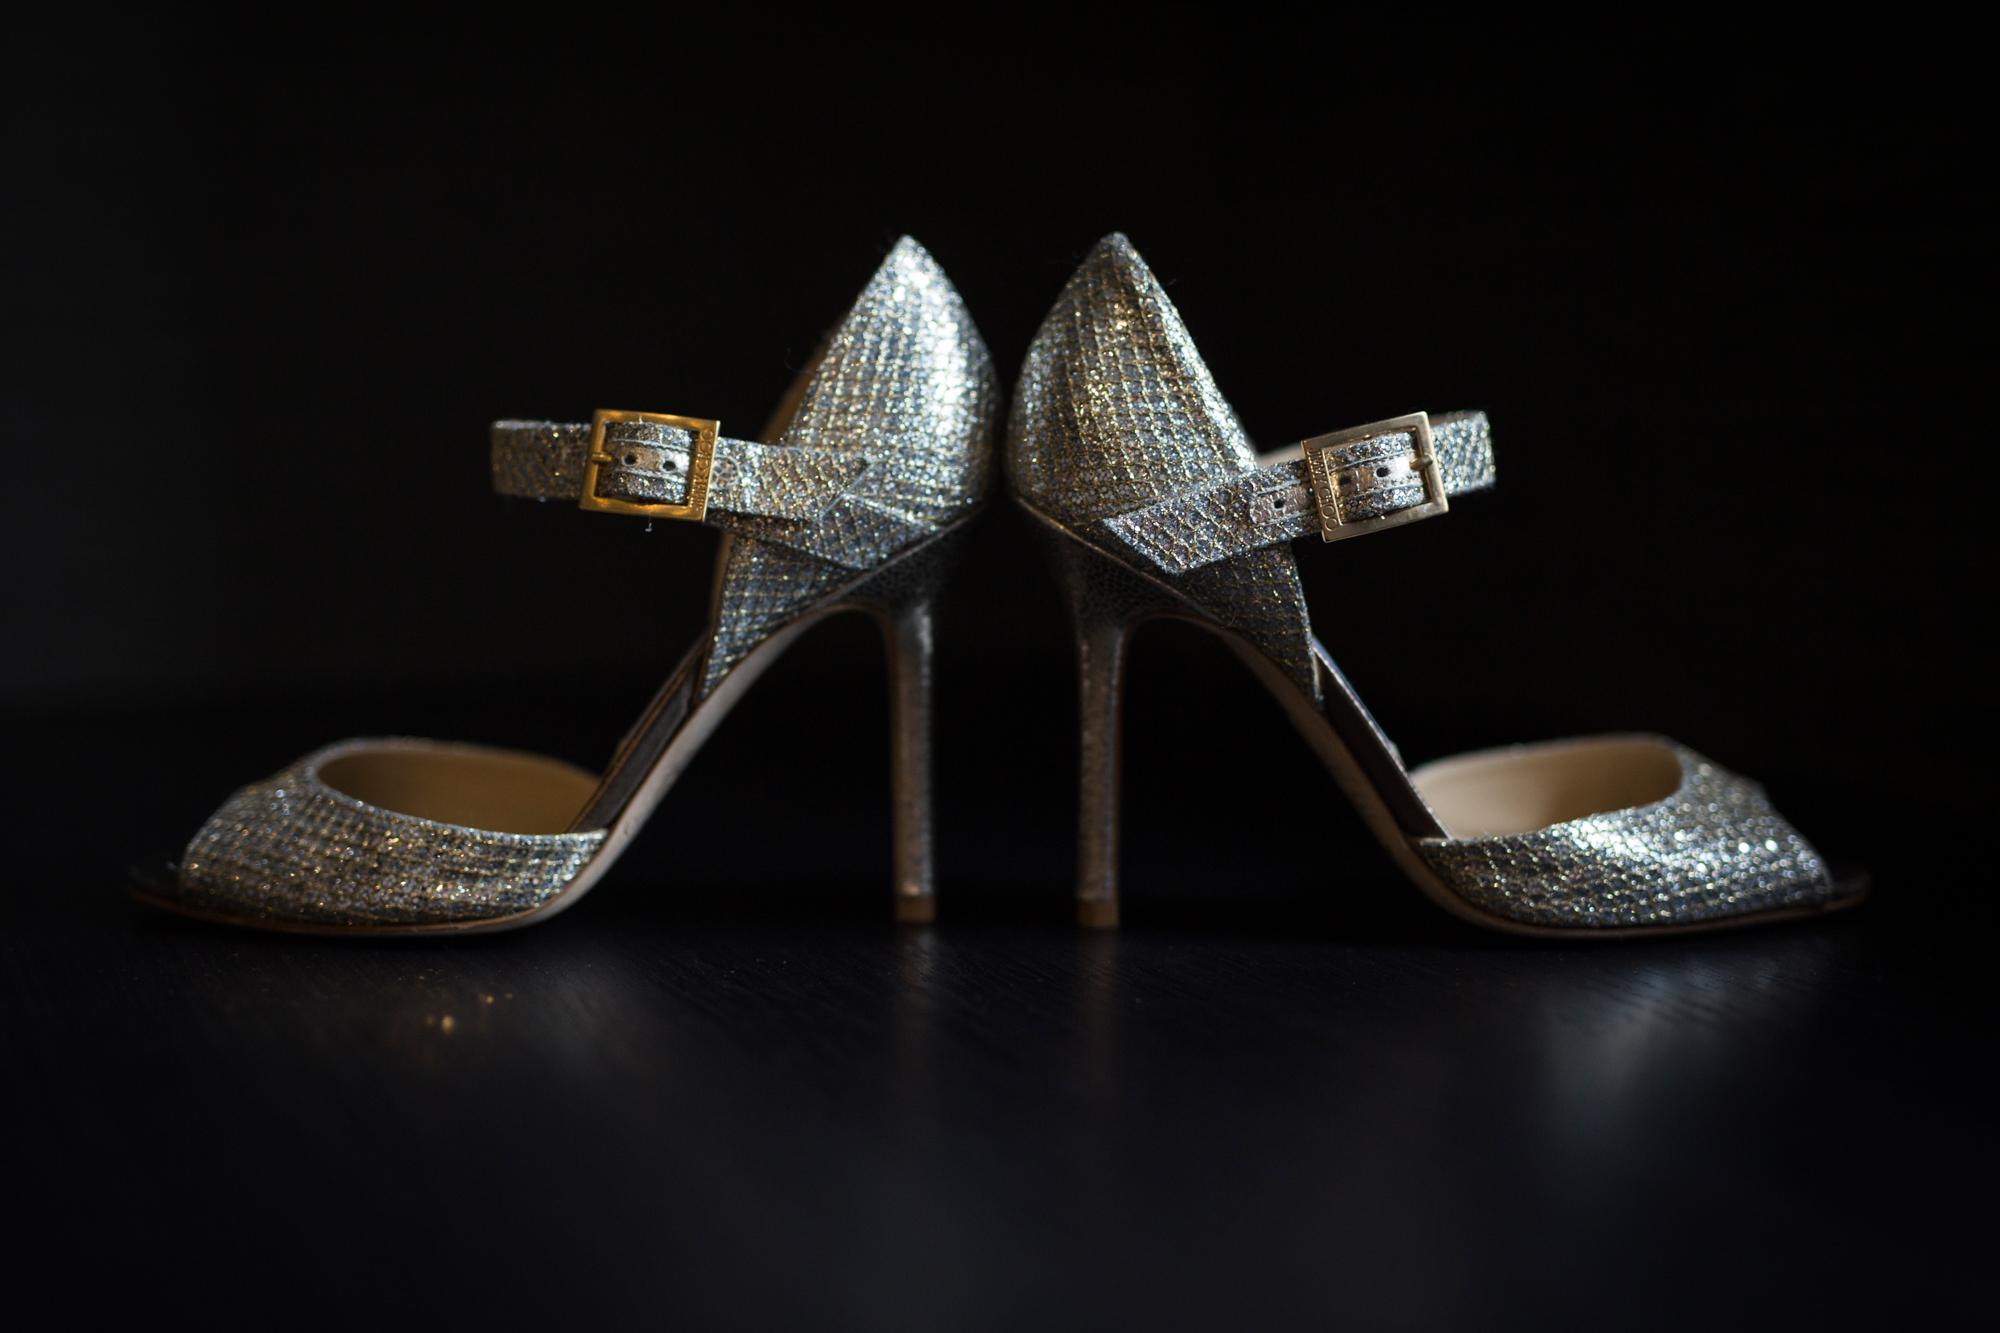 Bridal shoes at InterContinental Chicago